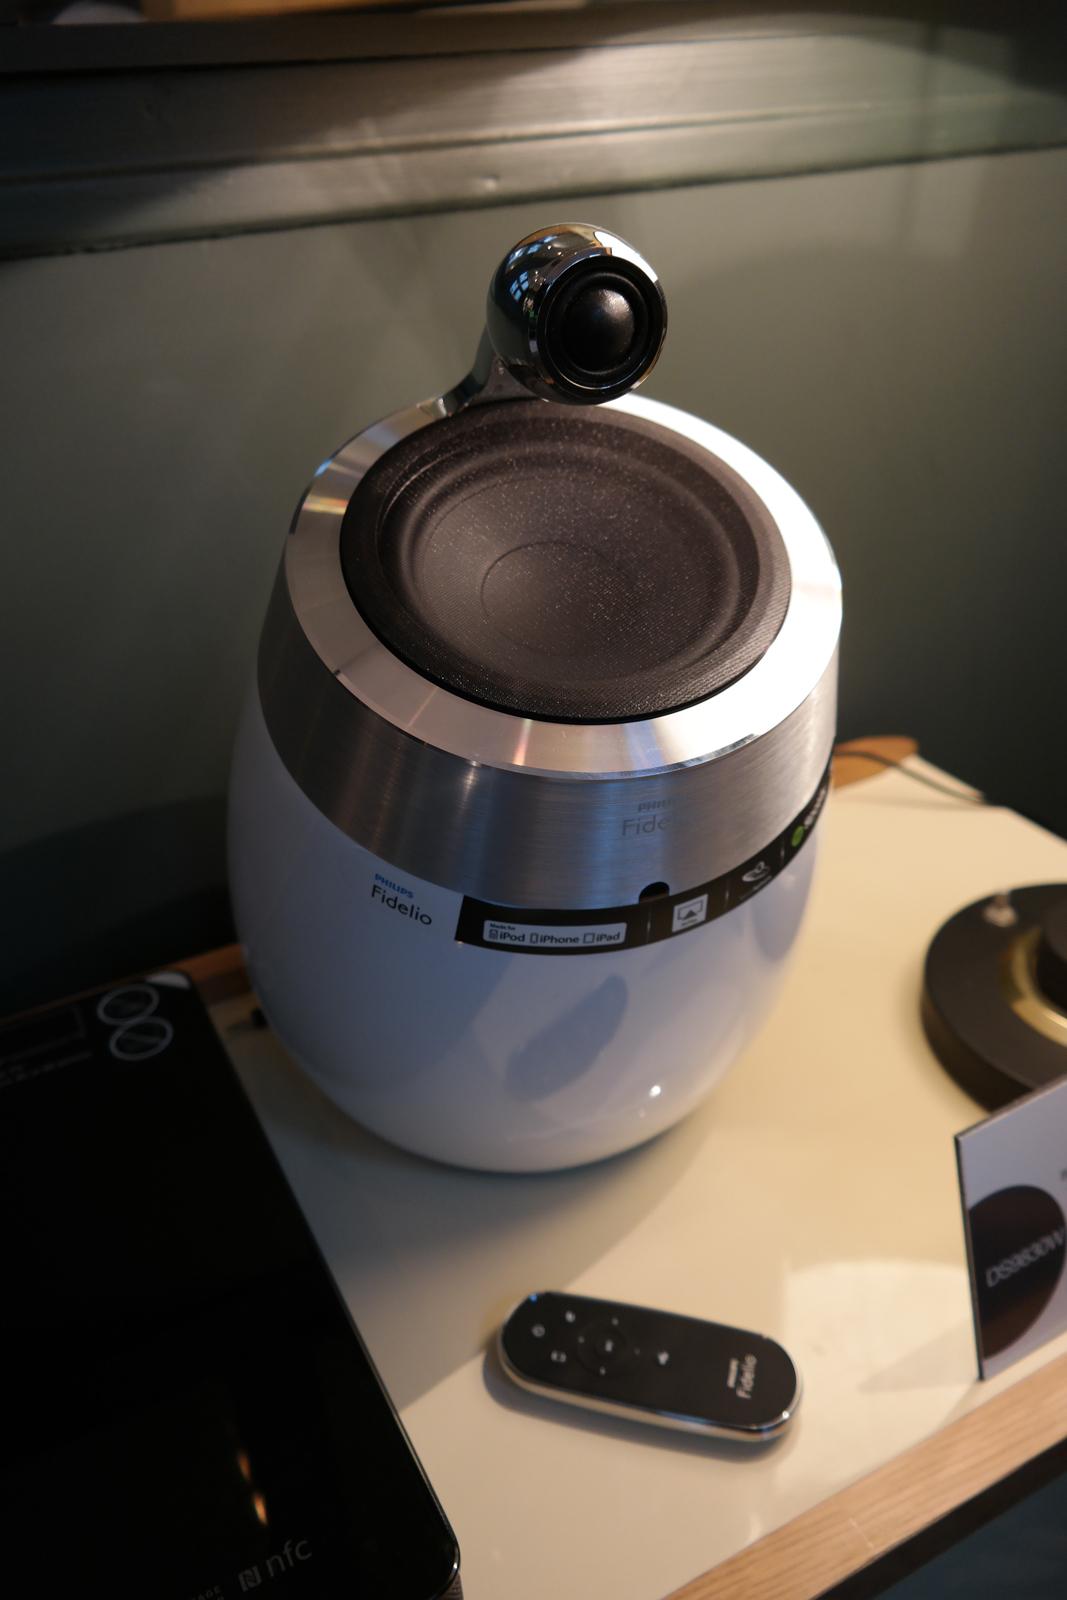 Enceinte Philips Fidelio SoundSphere